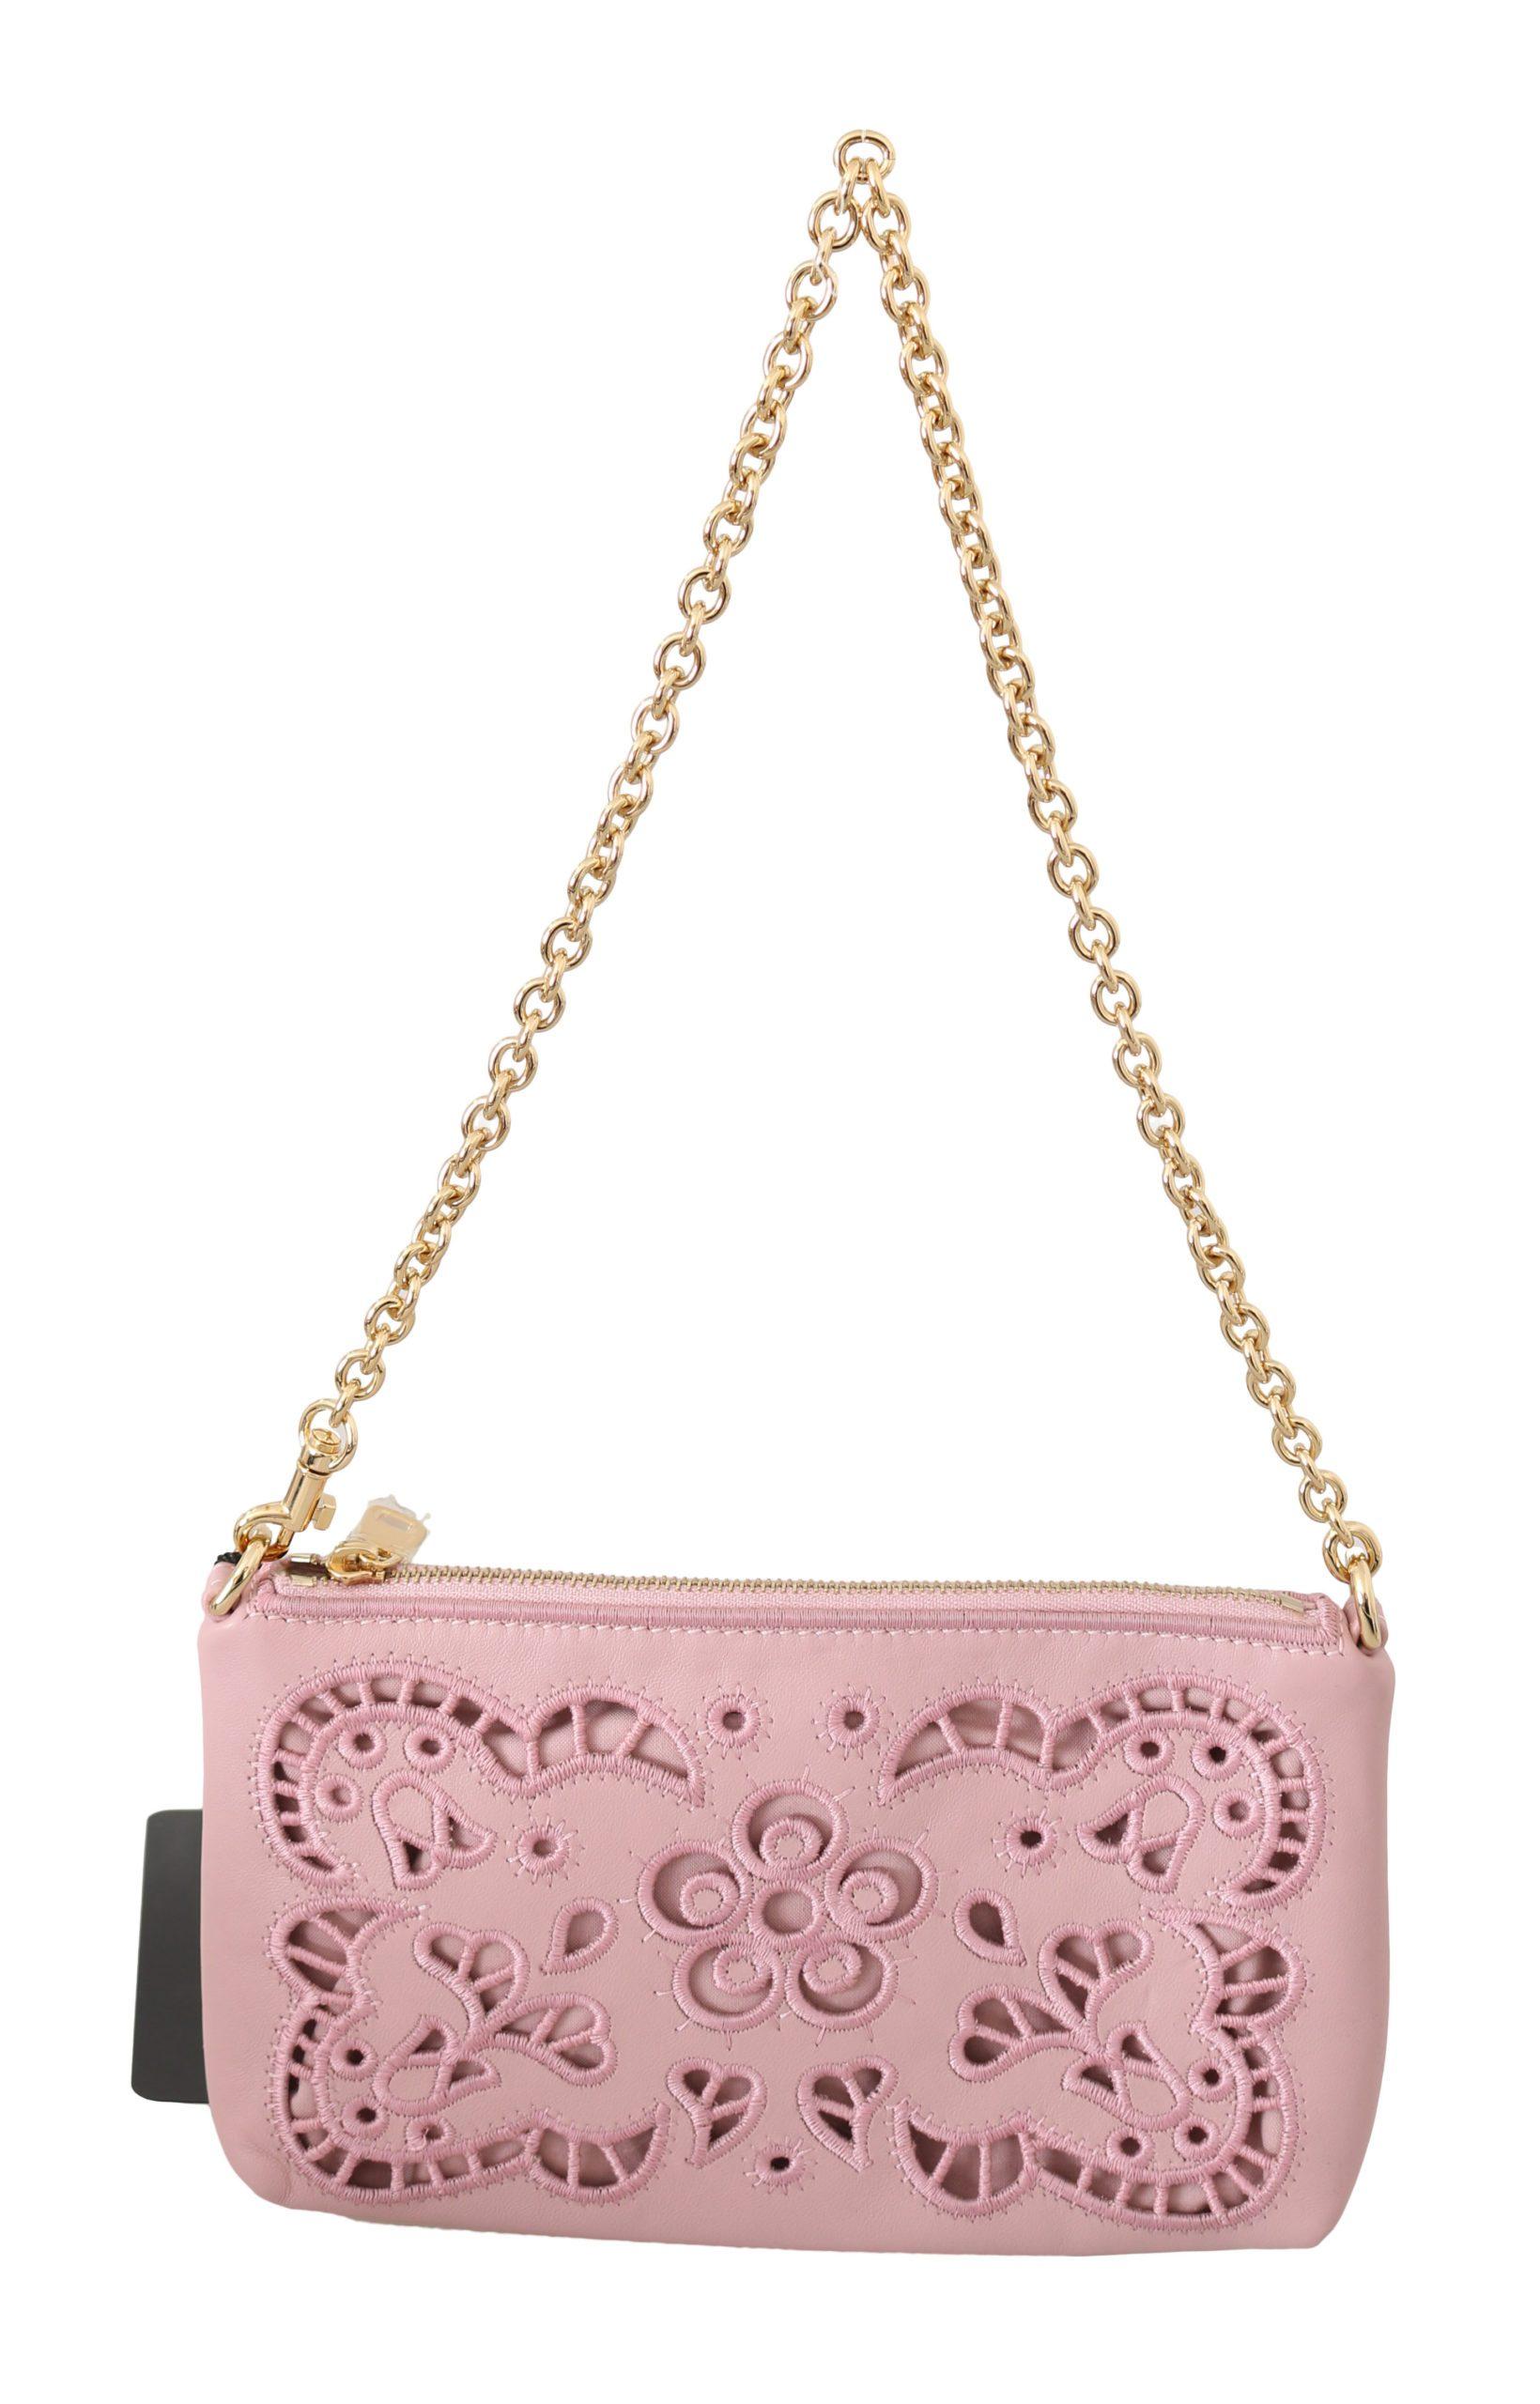 Dolce & Gabbana Women's Cutout Leather Shoulder Bag Pink VAS8867